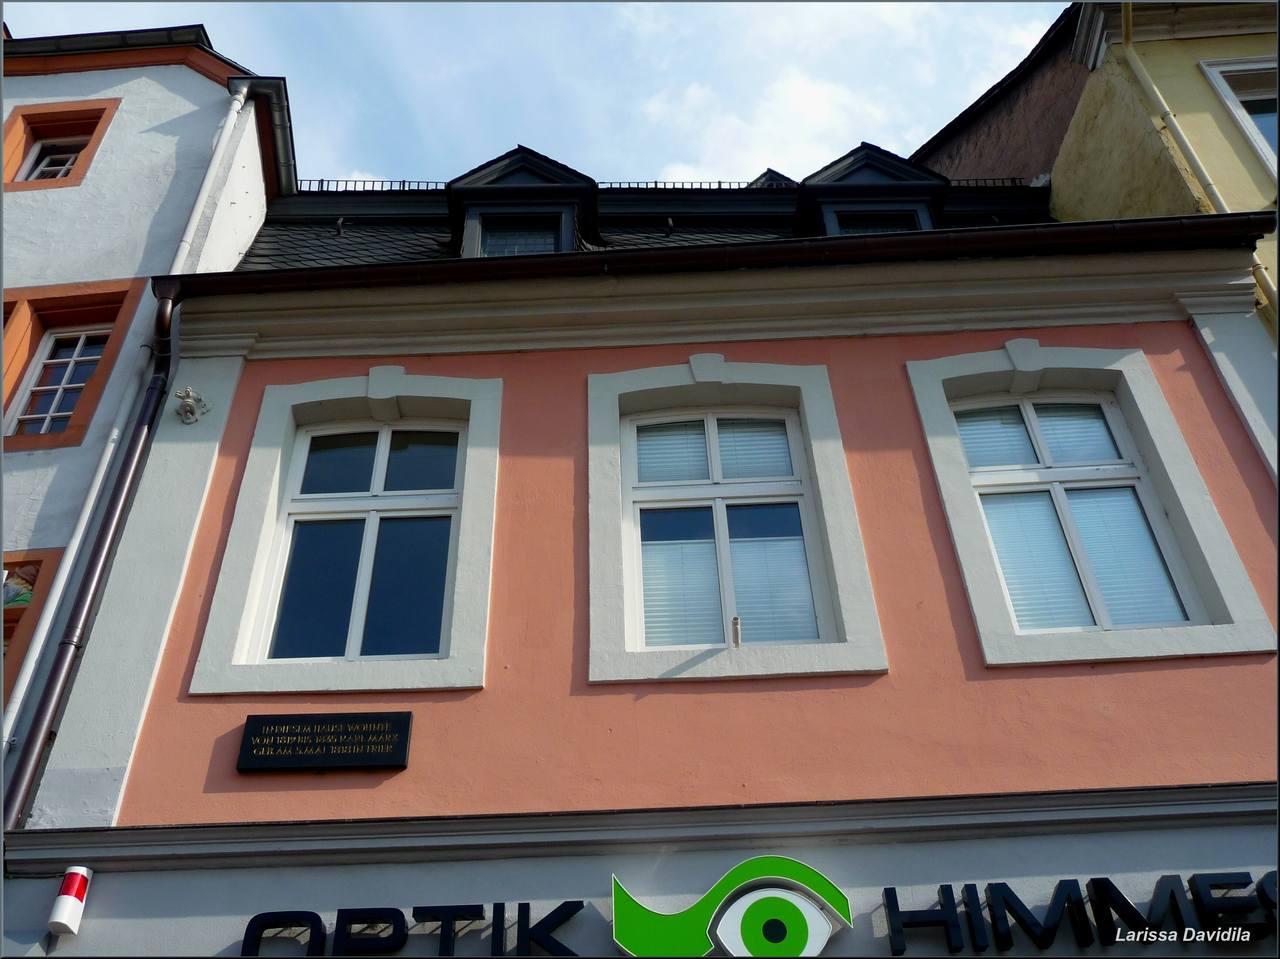 Trier-26.8.2009 (27)